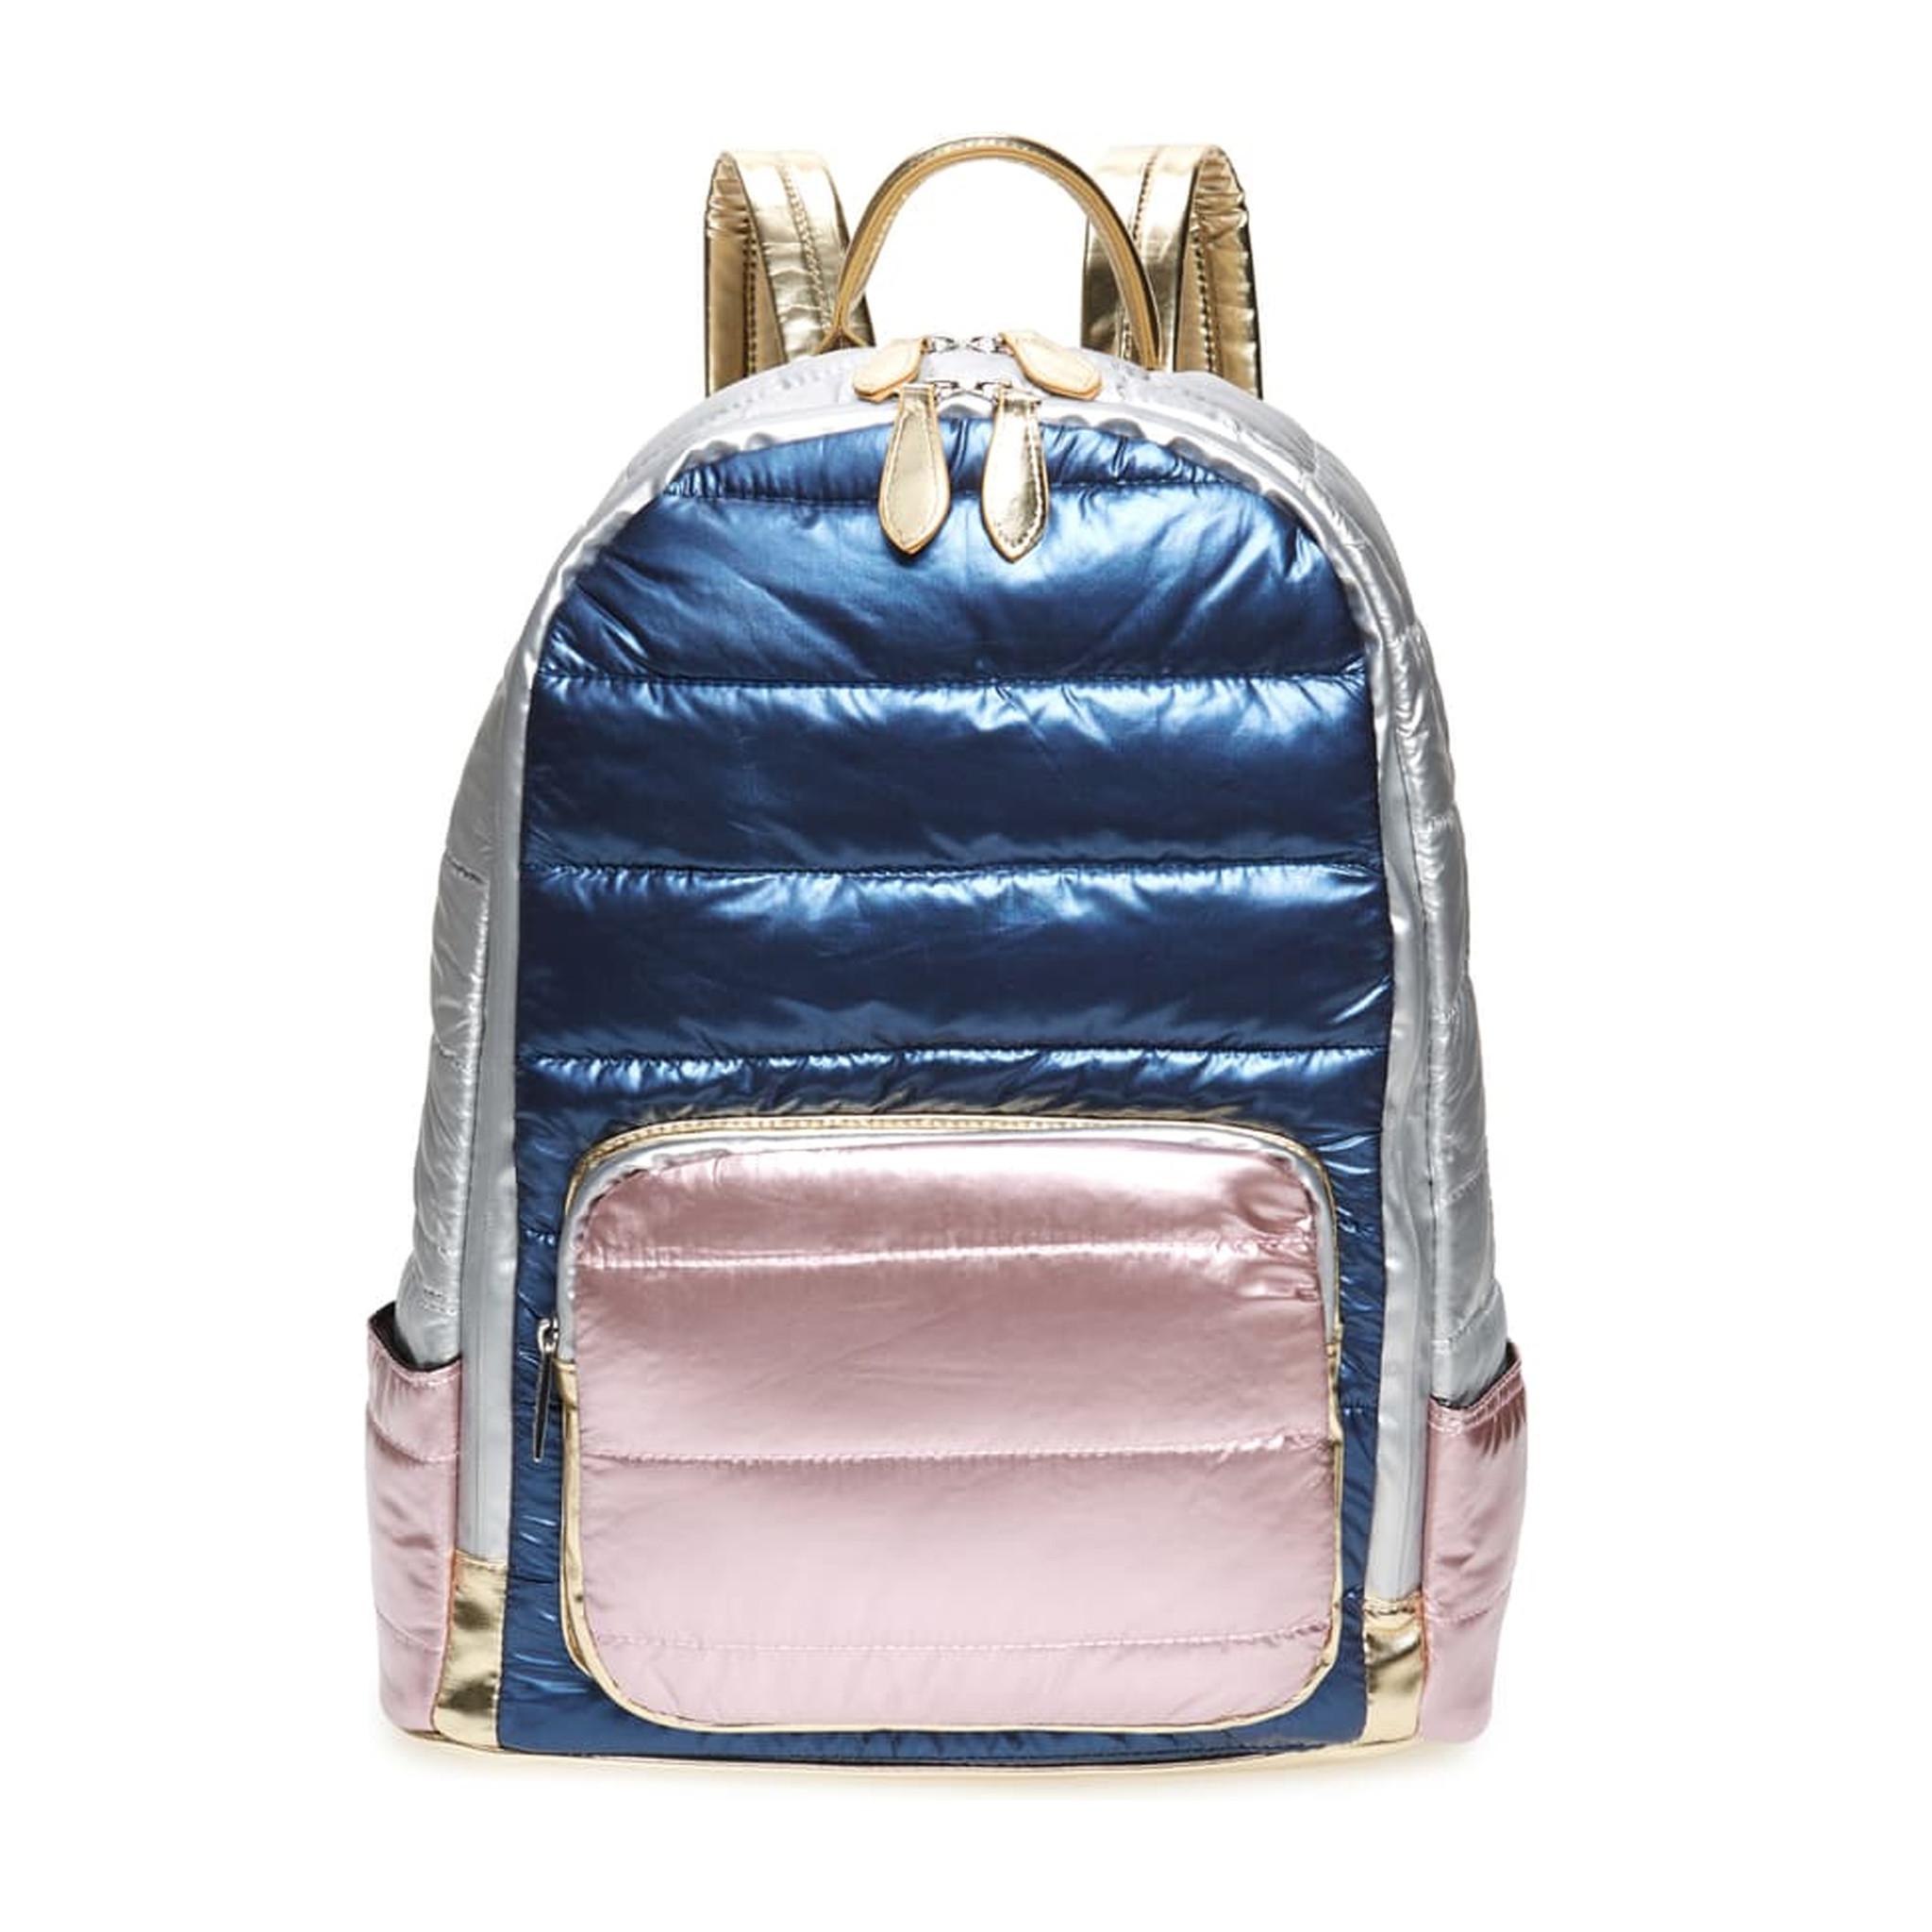 Bari Lynn Metallic Navy & Pink Puffy Backpack